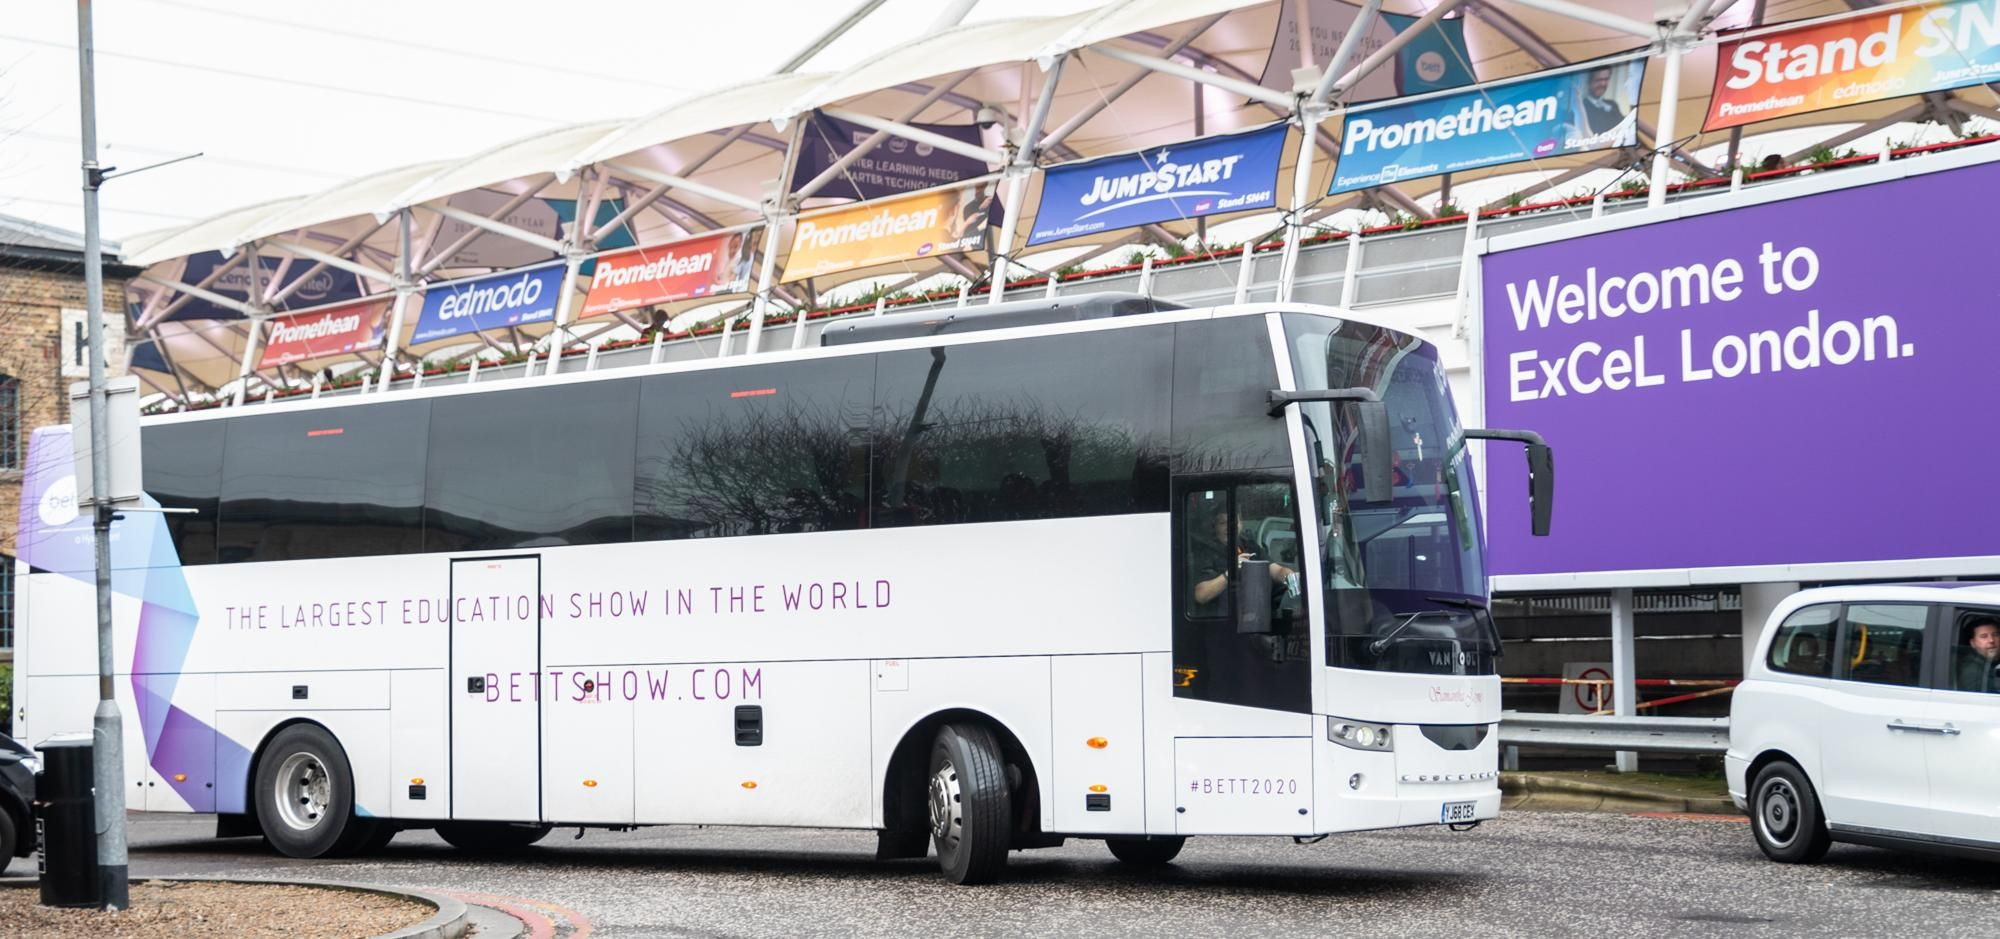 All Aboard - the Bett Bus!